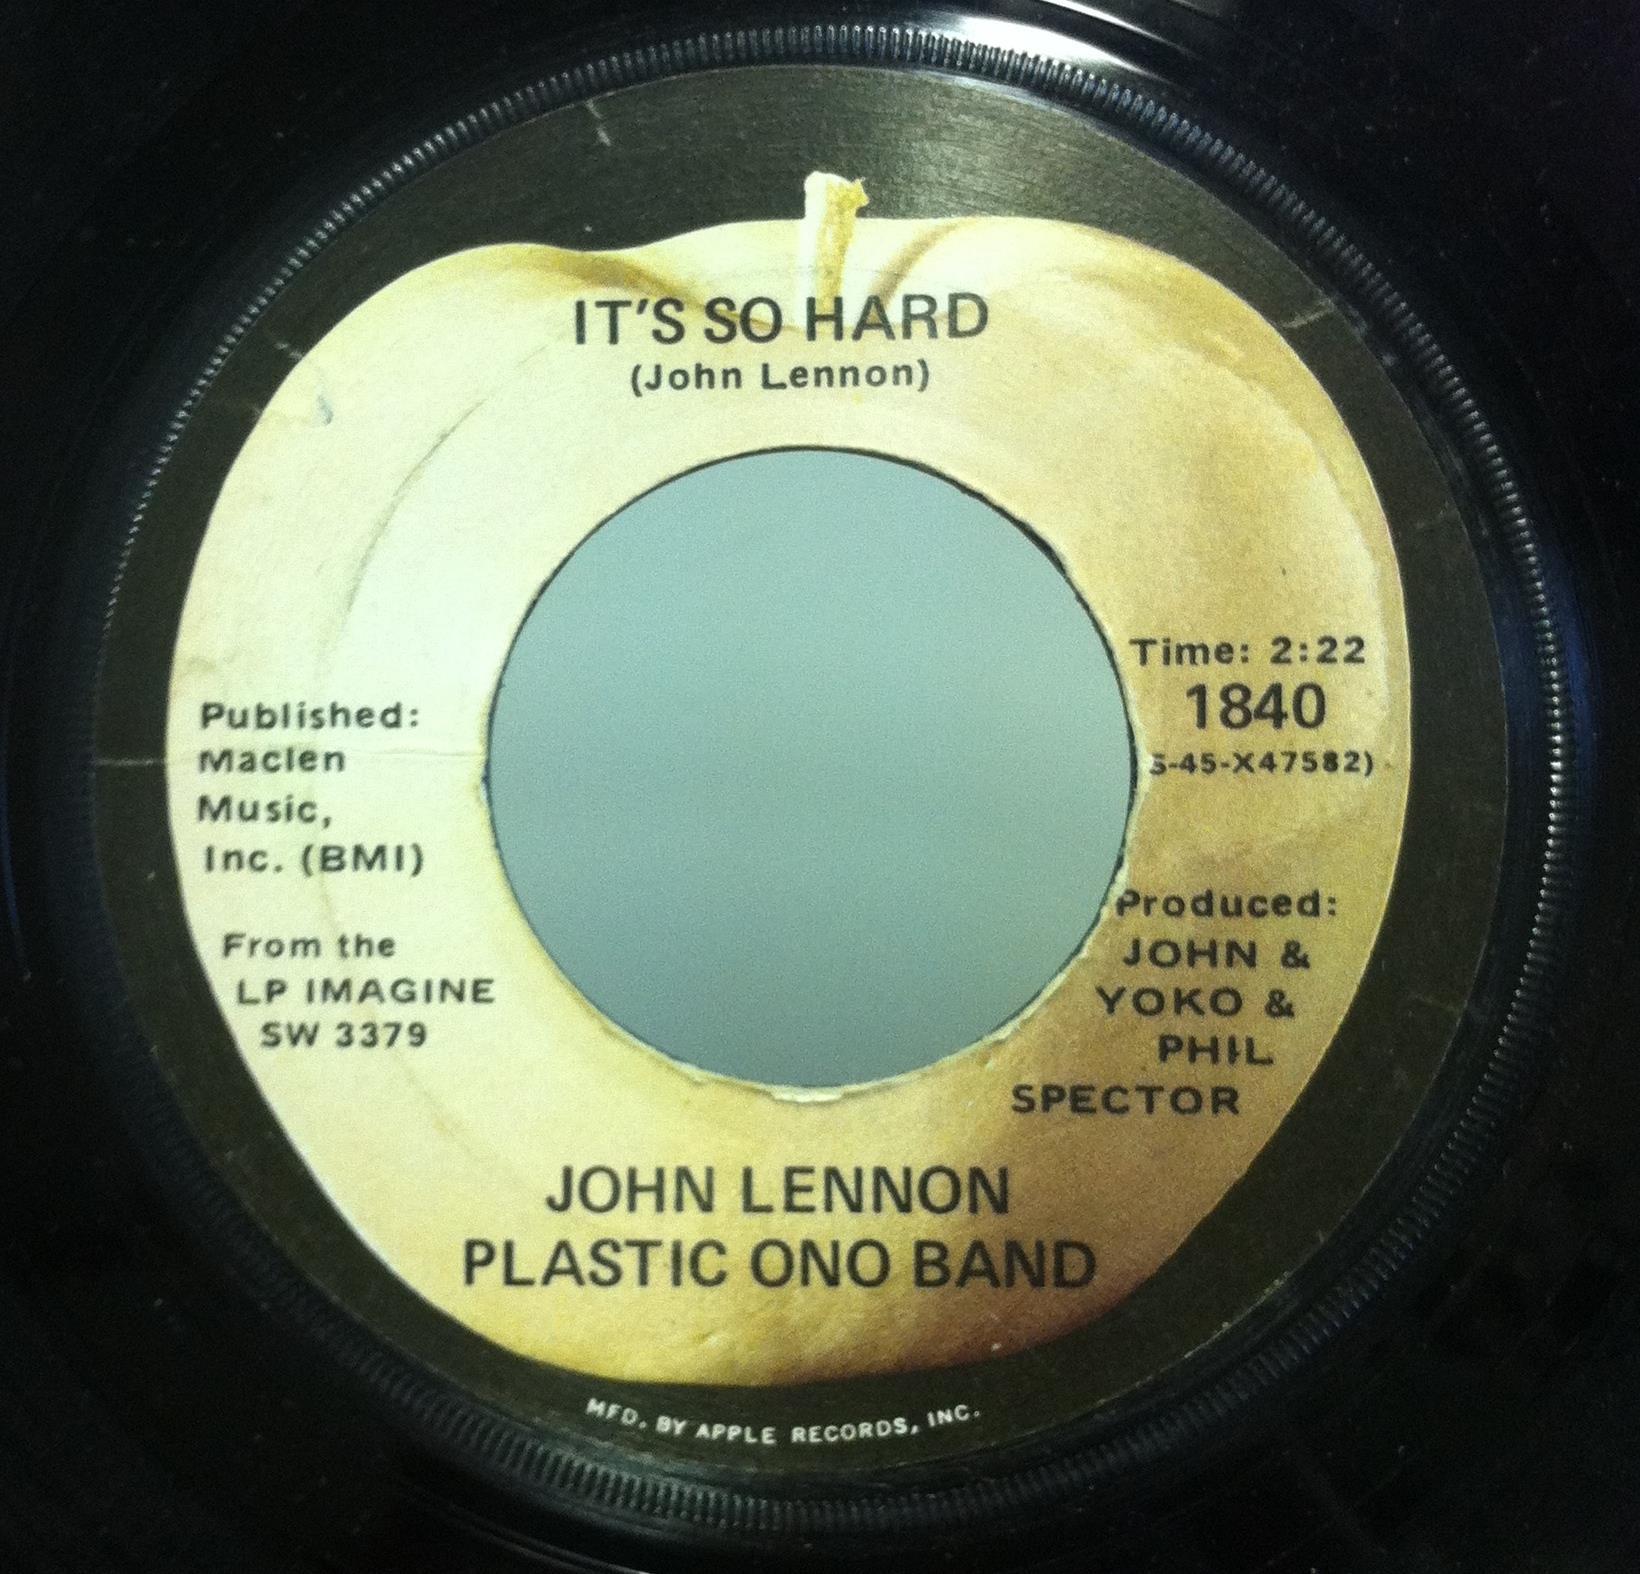 "John Lennon & Plastic Ono Band - John Lennon & Plastic Ono Band Imagine / It's So Hard 7"" Vg Apple 1840 Usa 45 (imagine / It"